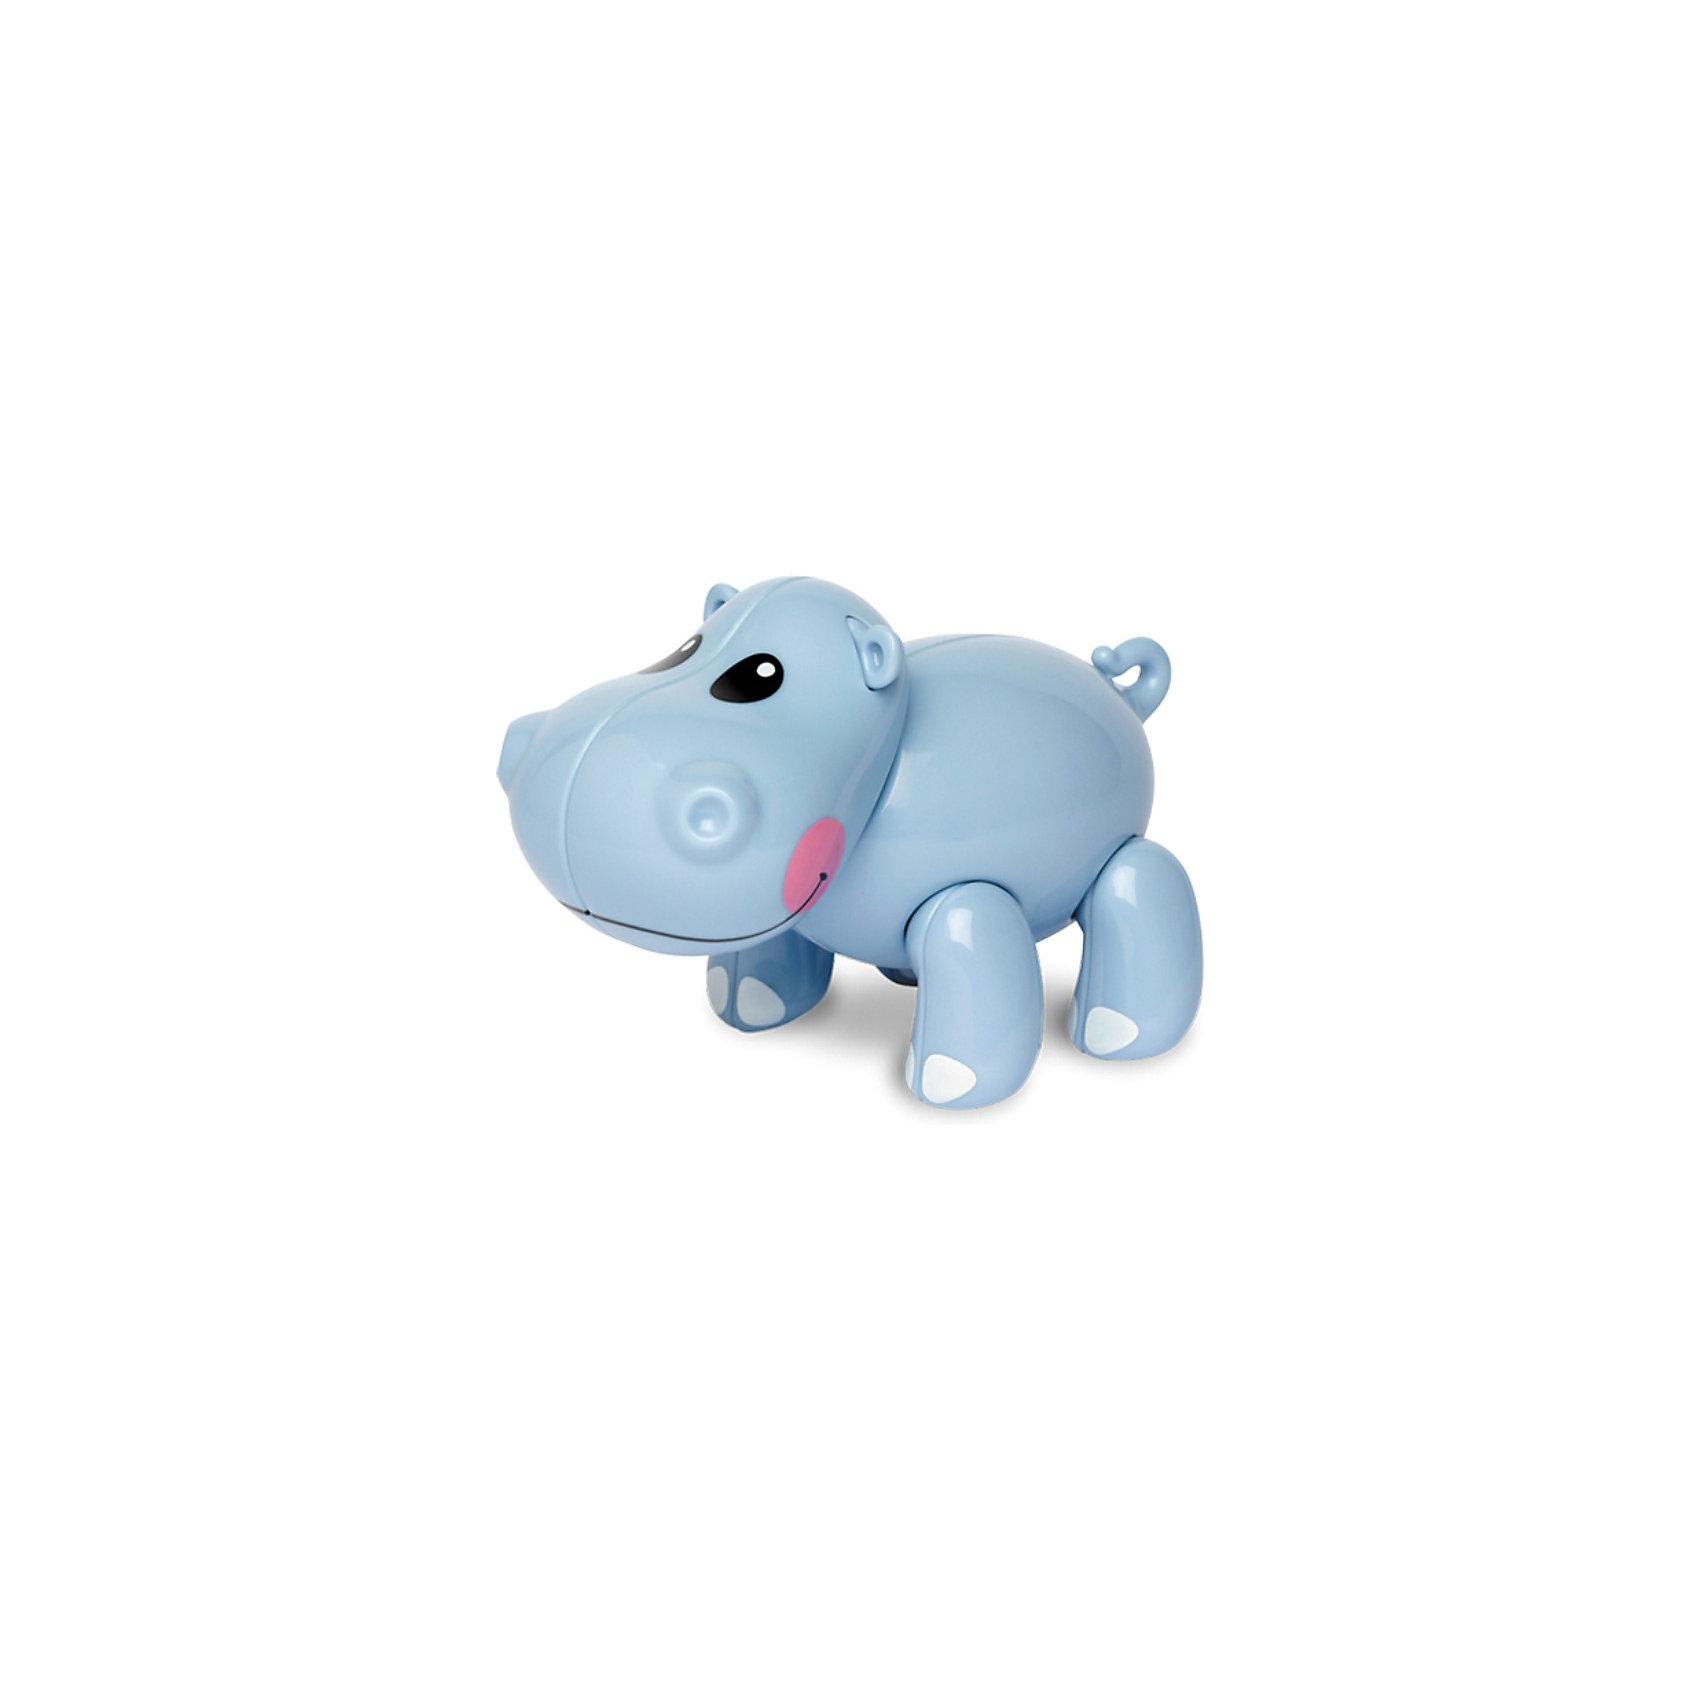 TOLO Фигурка Гиппопотам, Первые друзья, TOLO развивающие игрушки tolo toys тюлень